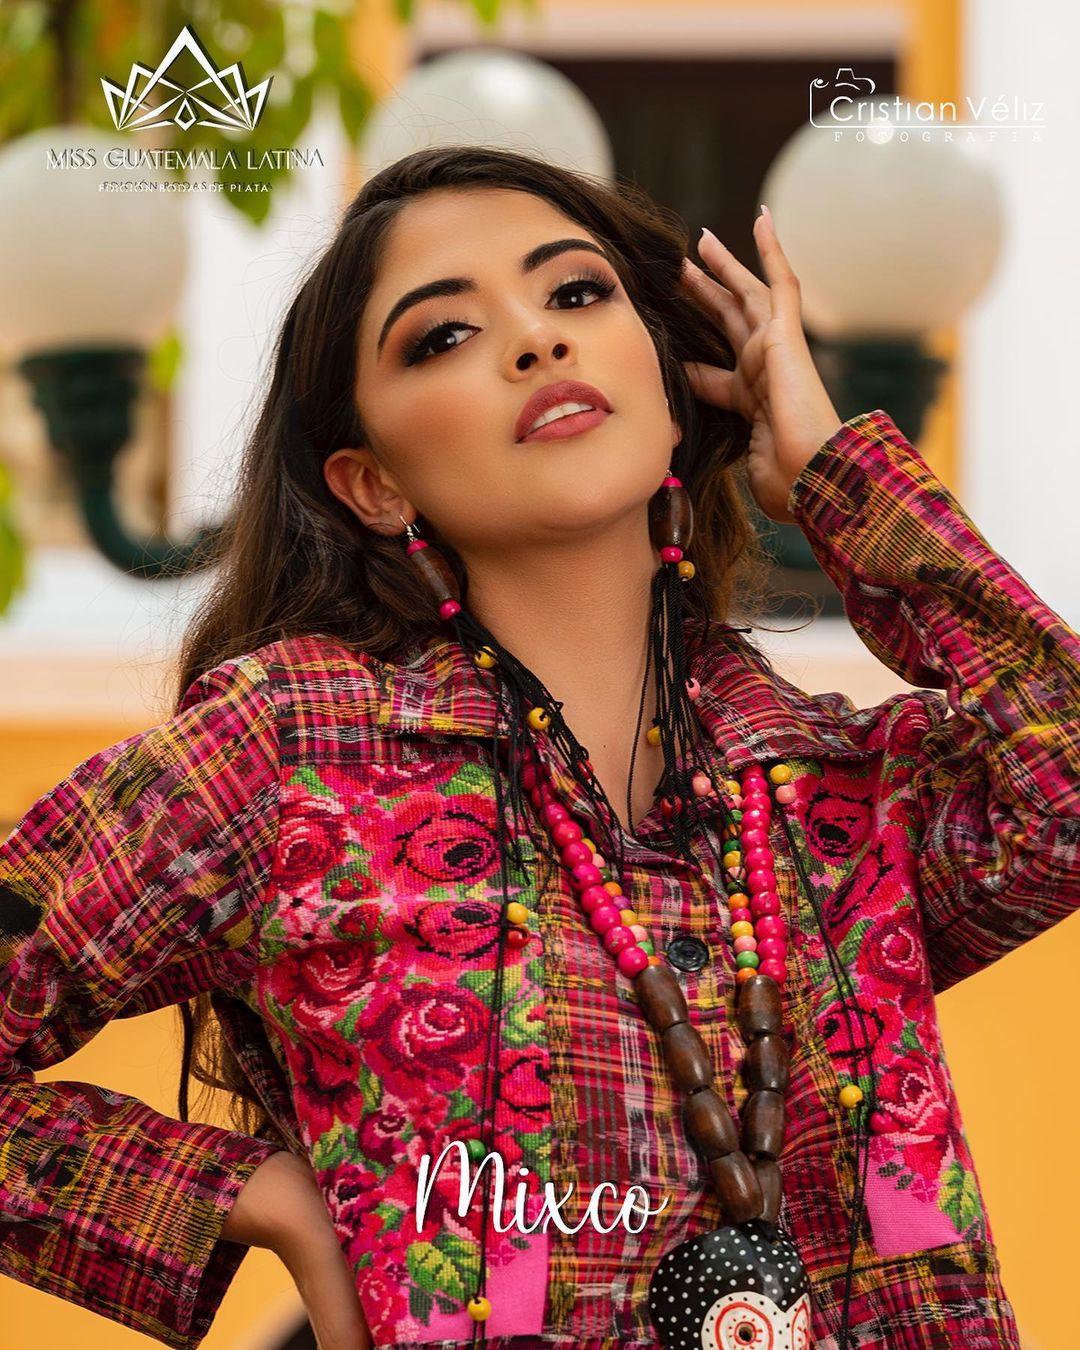 candidatas a miss guatemala latina 2021. final: 30 de abril. - Página 2 B2gvEJ